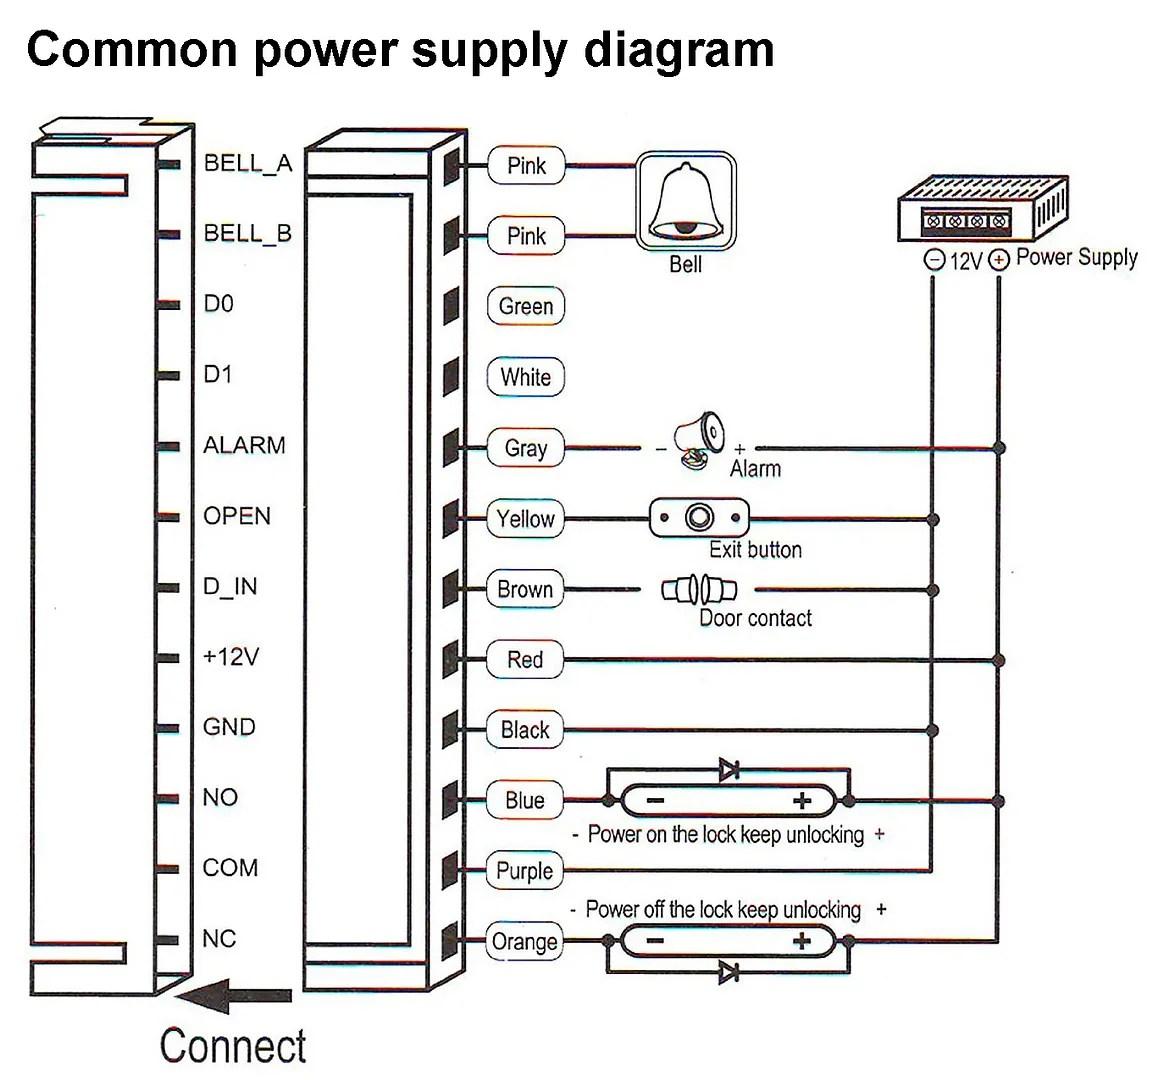 da3000 door access wiring diagram ge monogram oven unacart global online shopping store for electronics